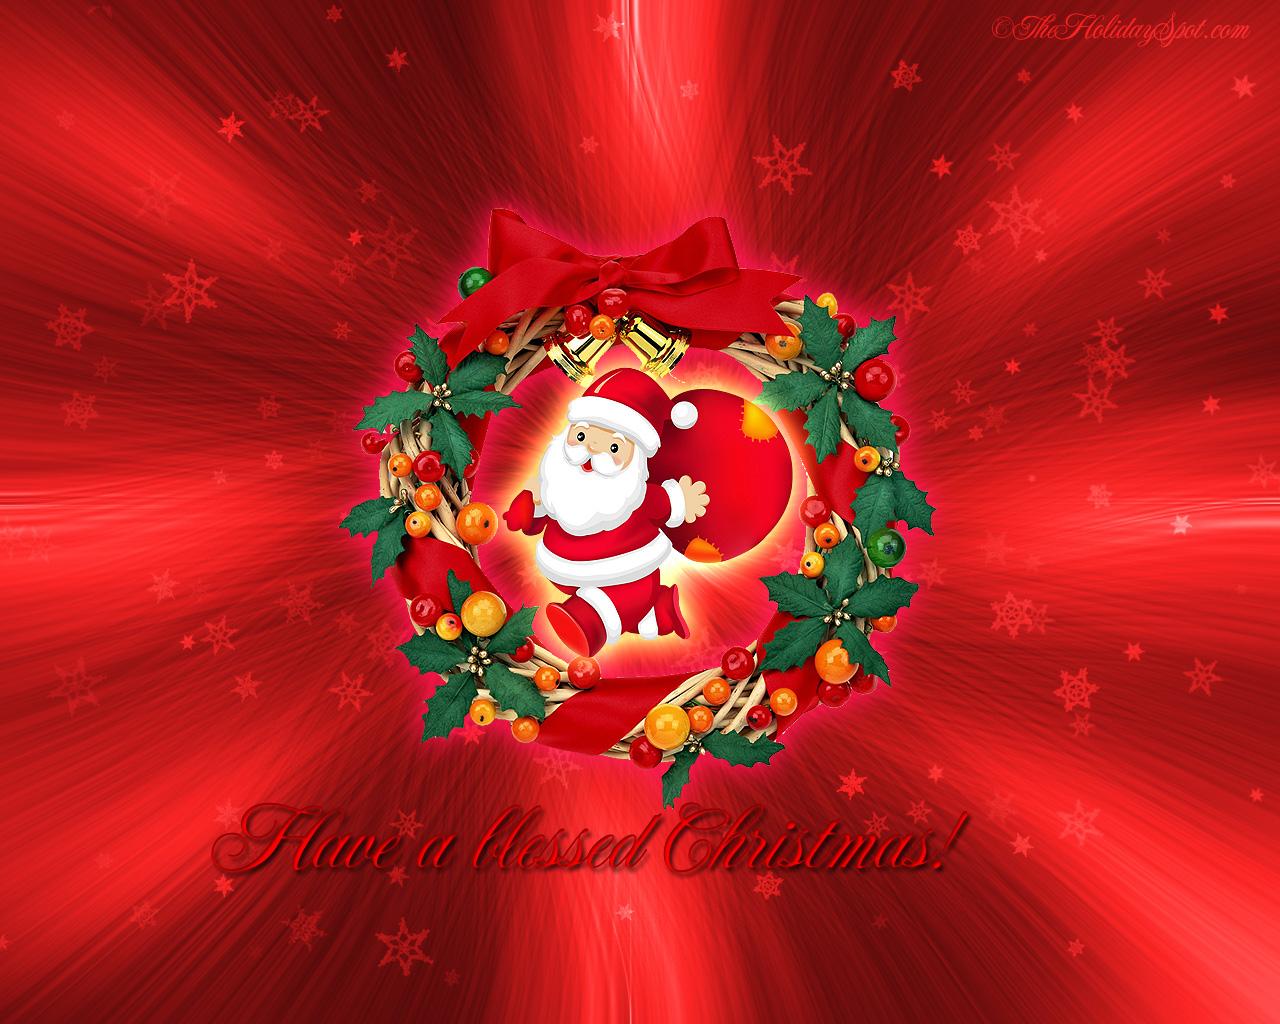 Christmas Stocking Wallpaper